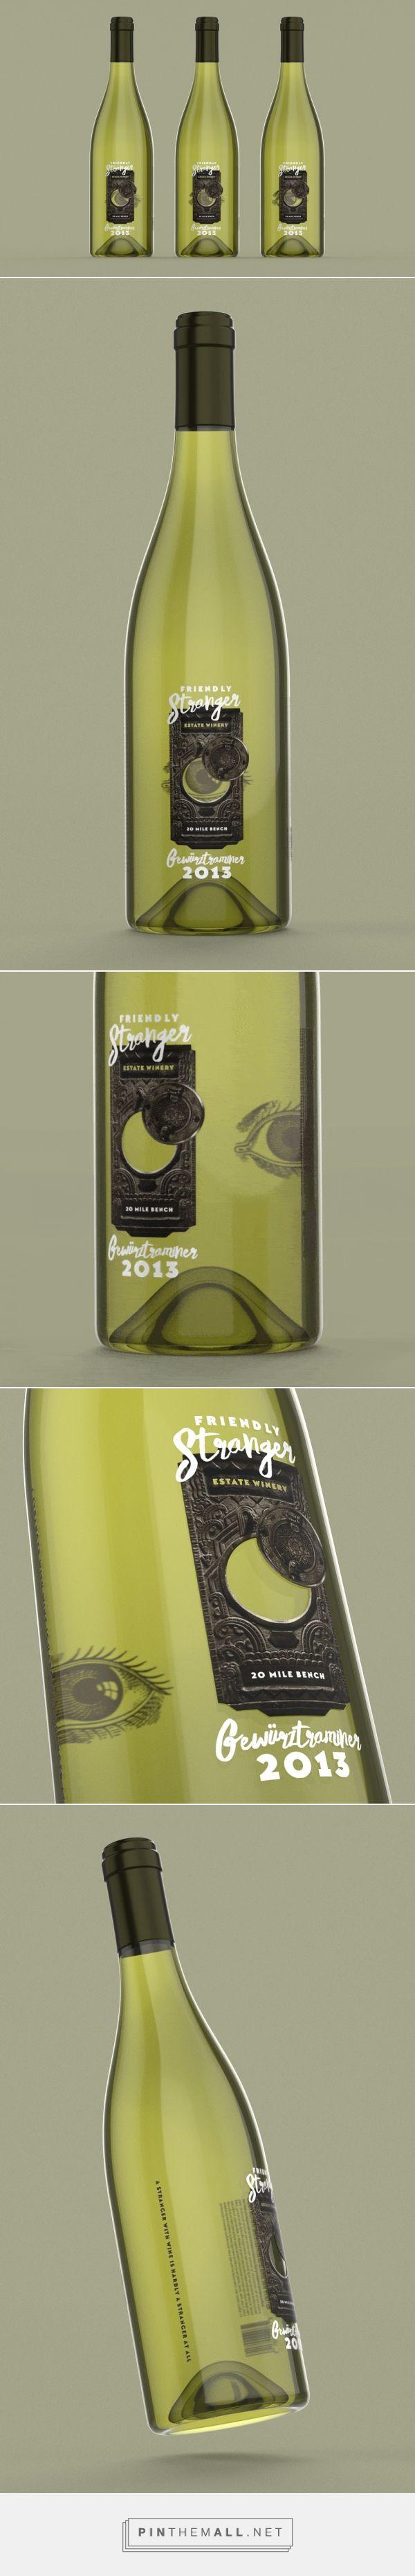 Friendly Stranger wine packaging design by Chargefield - http://www.packagingoftheworld.com/2017/12/friendly-stranger.html